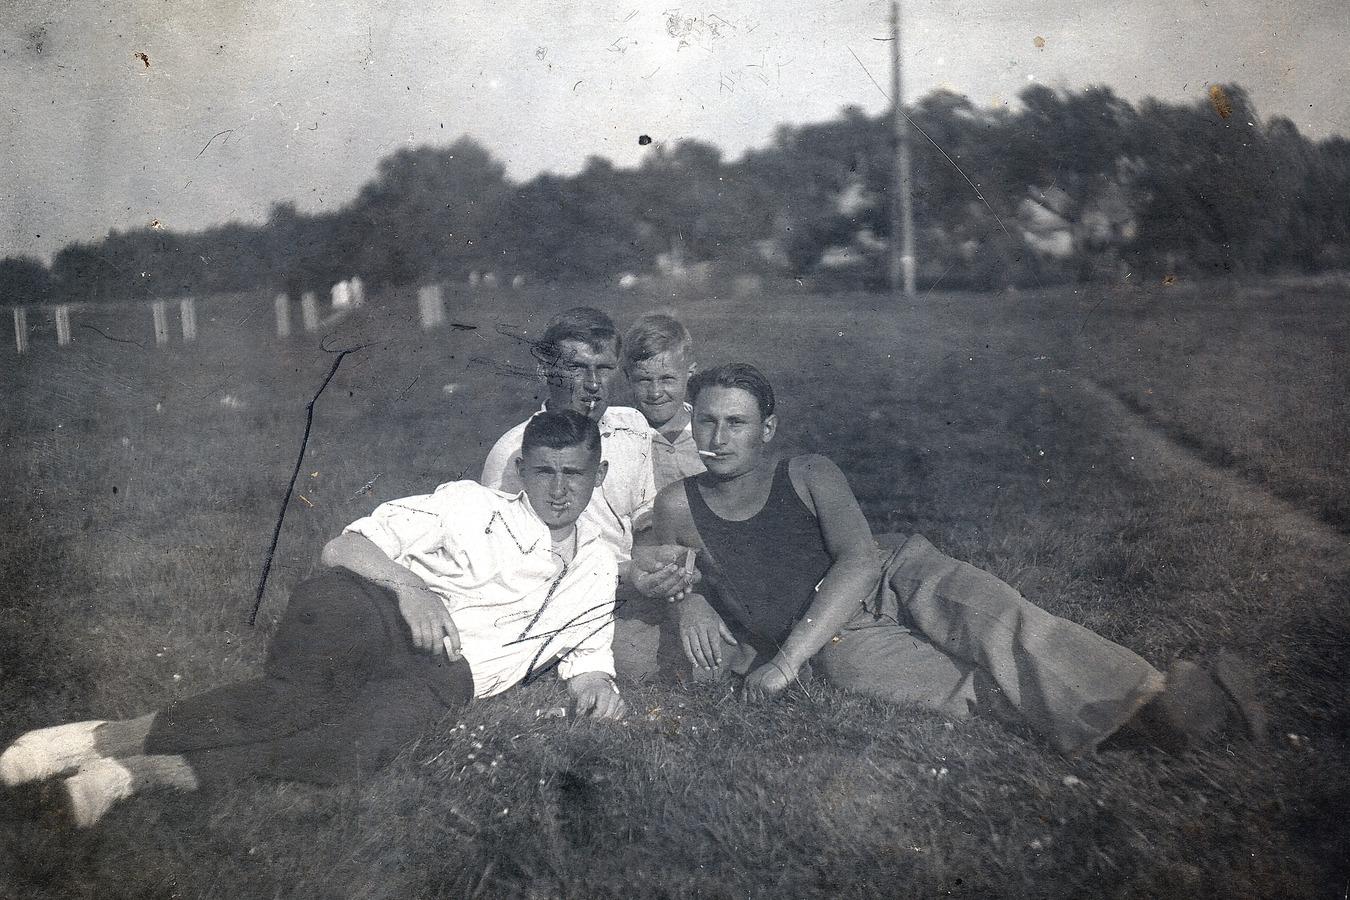 Elena Drapkina's elder brother and his friends